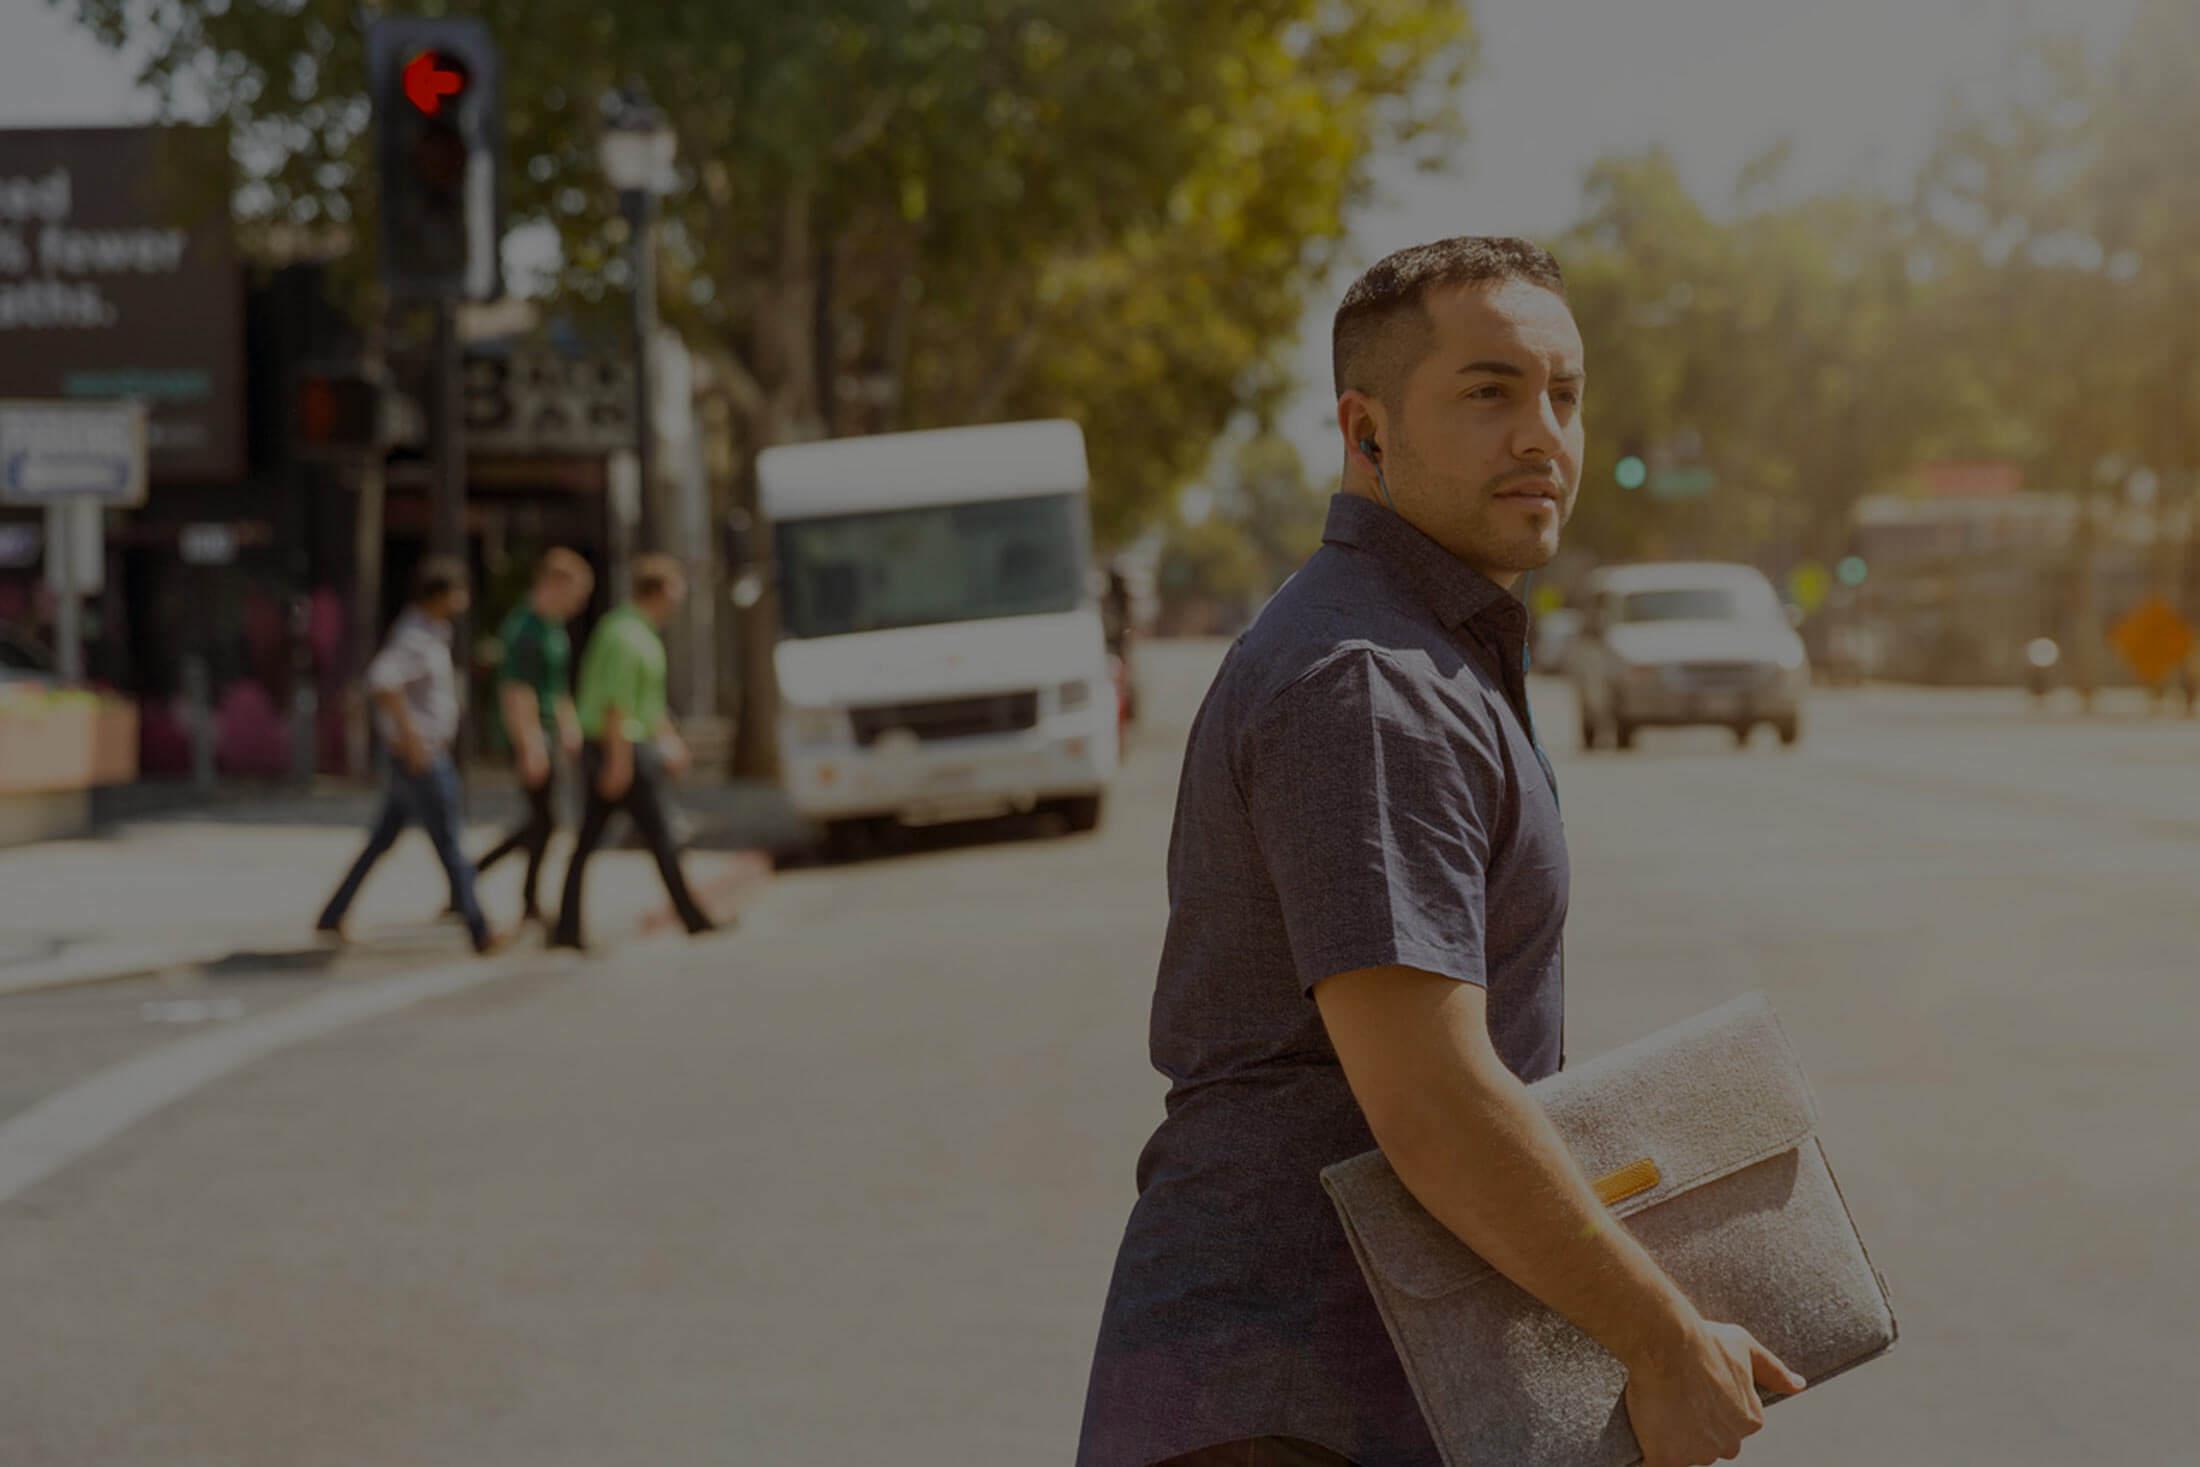 Pole emploi - offre emploi Magasinier (H/F) - Le Robert